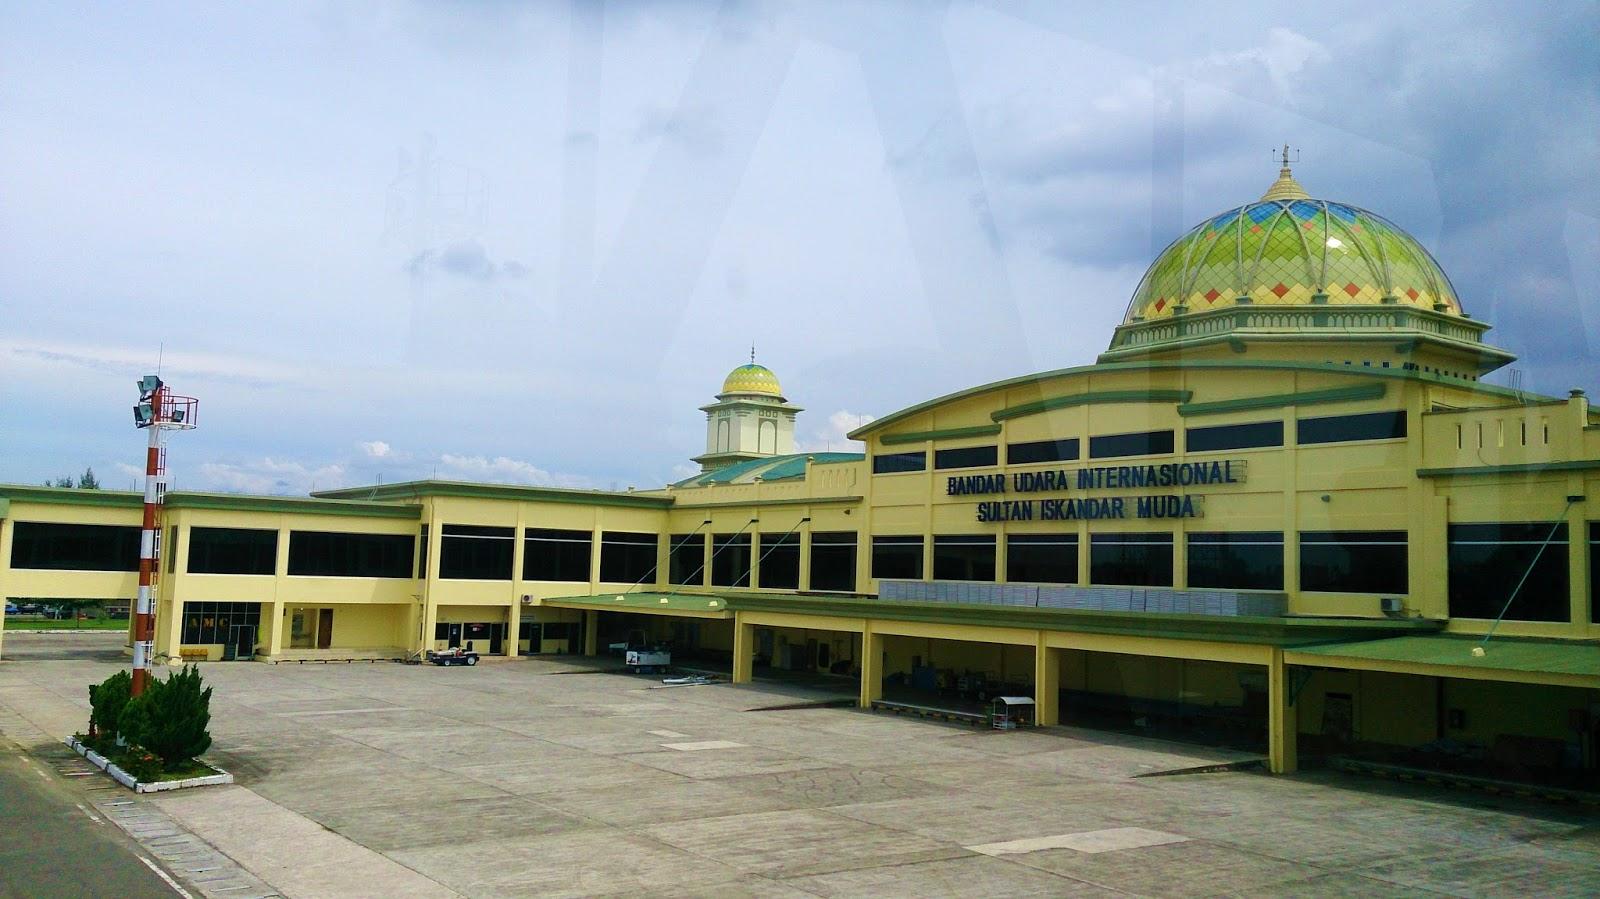 Discovered Sumatra Banda Aceh Bakso Ancol Ads Friendship Village Of Indonesia And Tiongkok China Tebing Lamreh Ujung Kelindu Pantai Pasir Putih Lhokme Beach Dhapu Kupi Pusaka Souvenir Day 1st Hepymoments